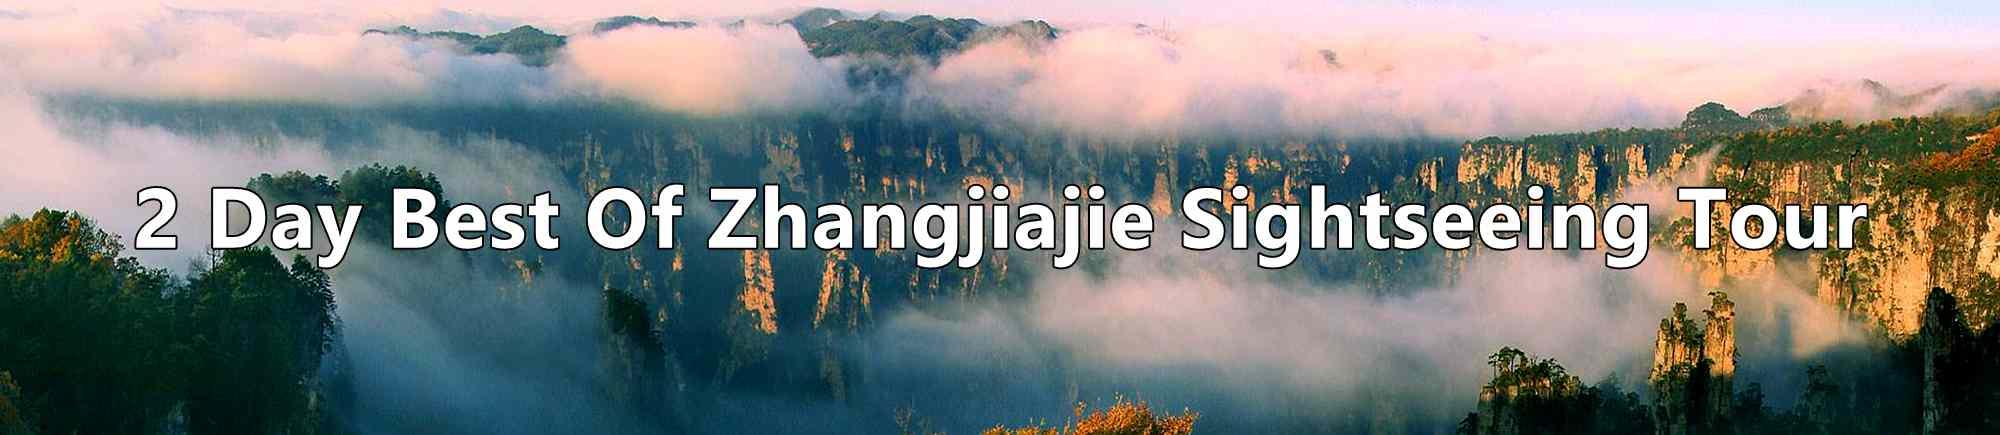 2-day-best-of-zhangjiajie-sighseeing-tour.jpg